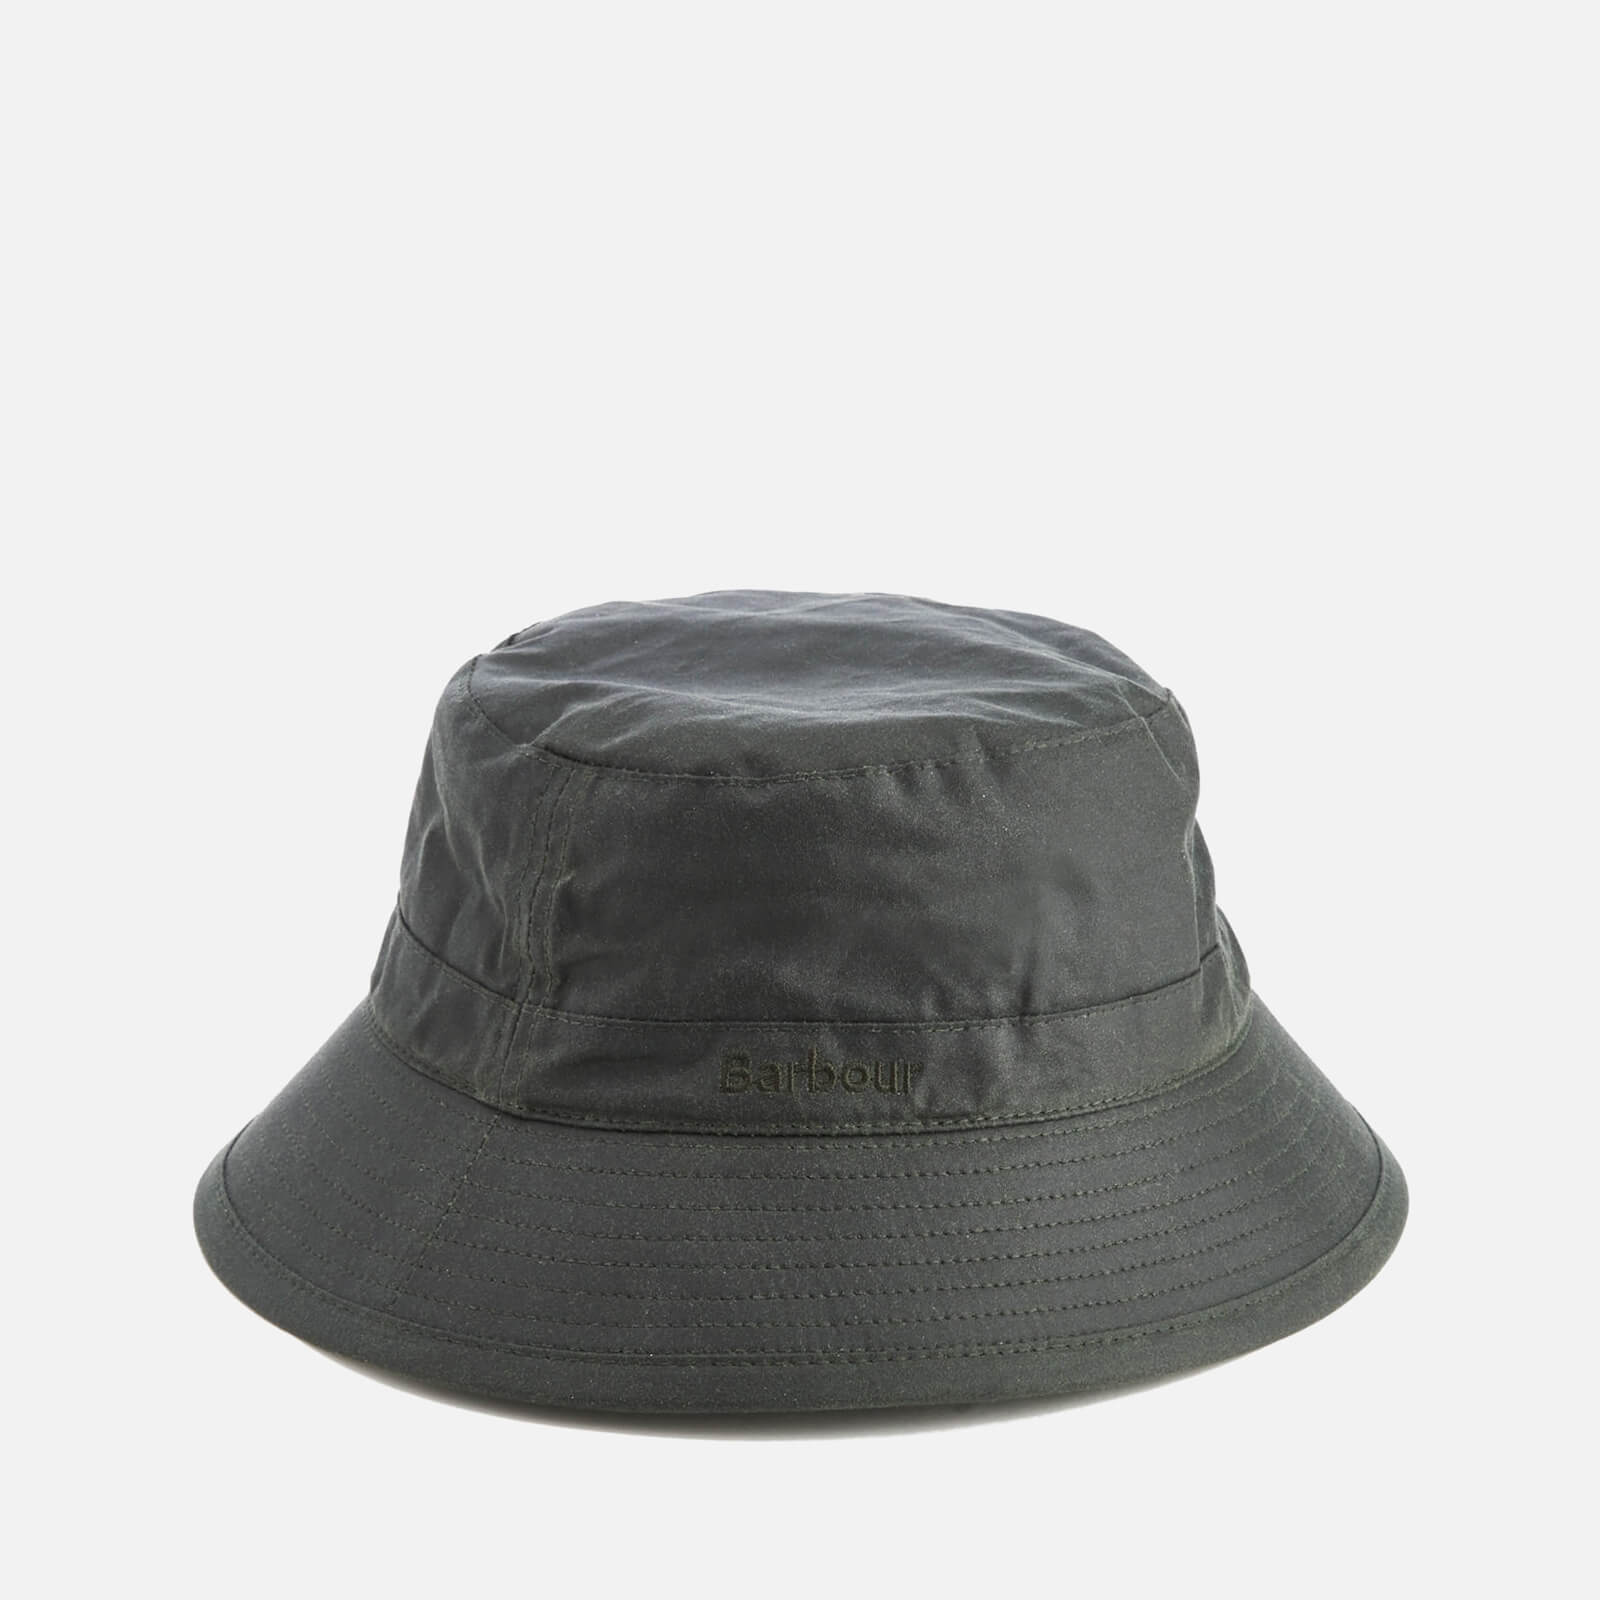 81afe4f98f54d Barbour Men s Wax Sports Hat - Sage - Free UK Delivery over £50